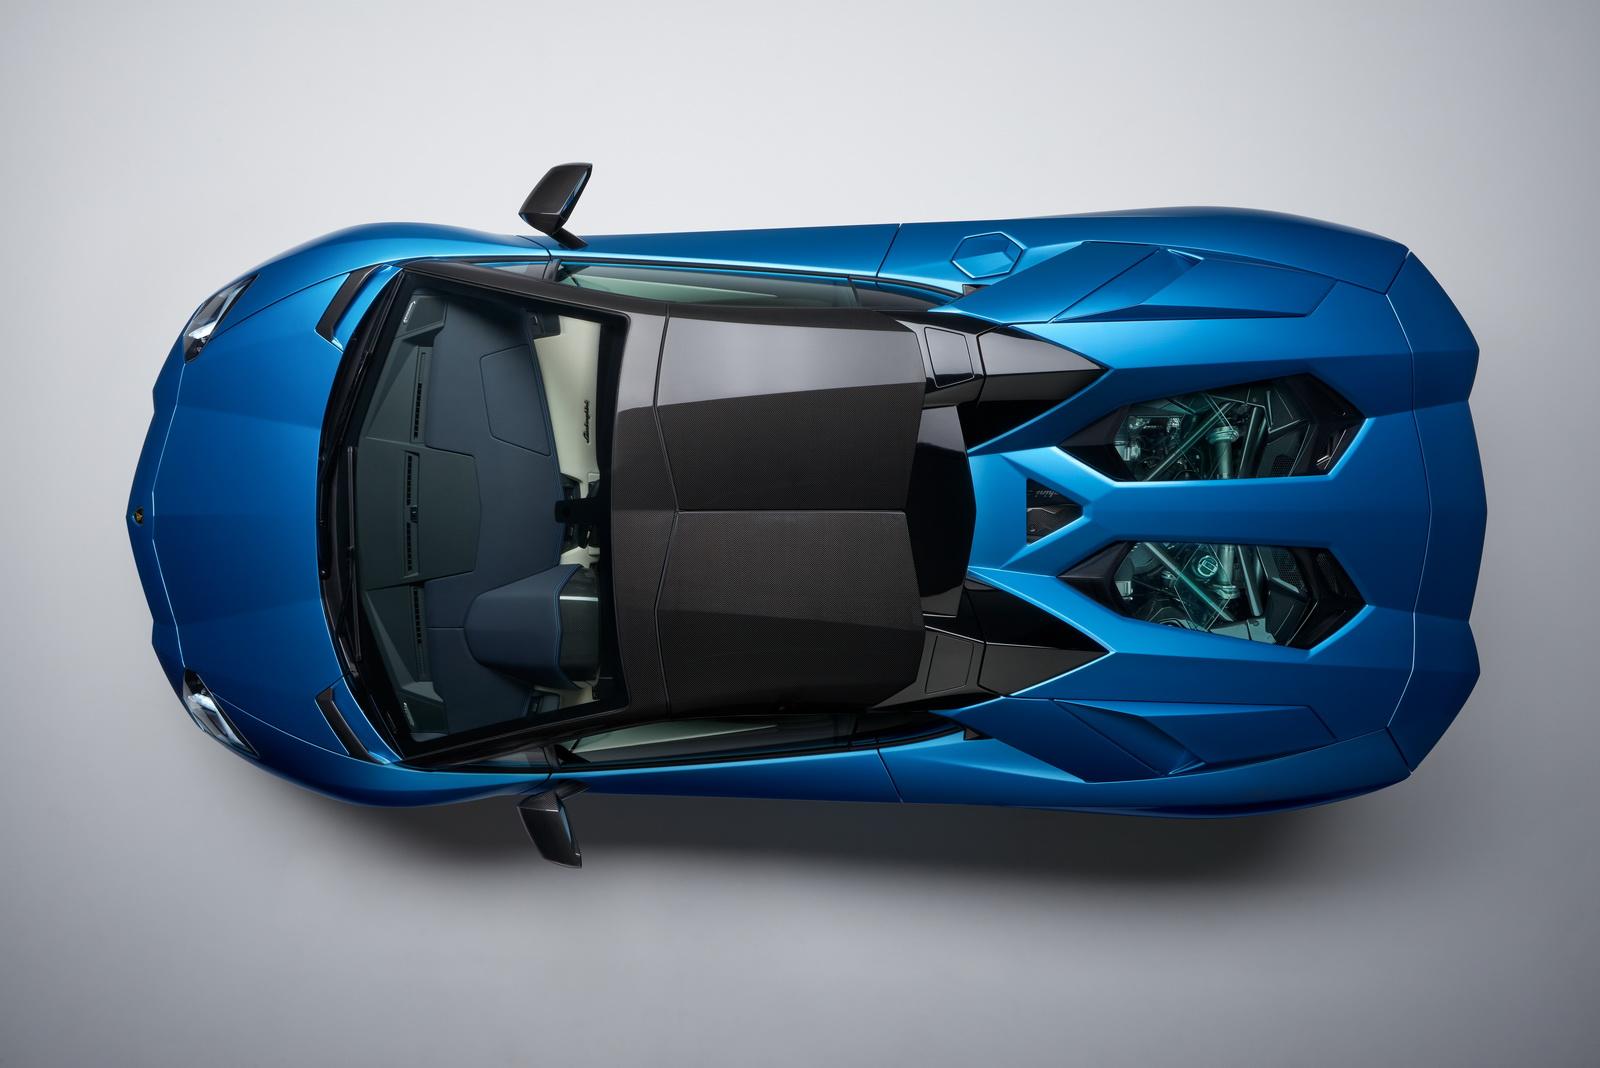 2018_Lamborghini_Aventador_S_Roadster_12